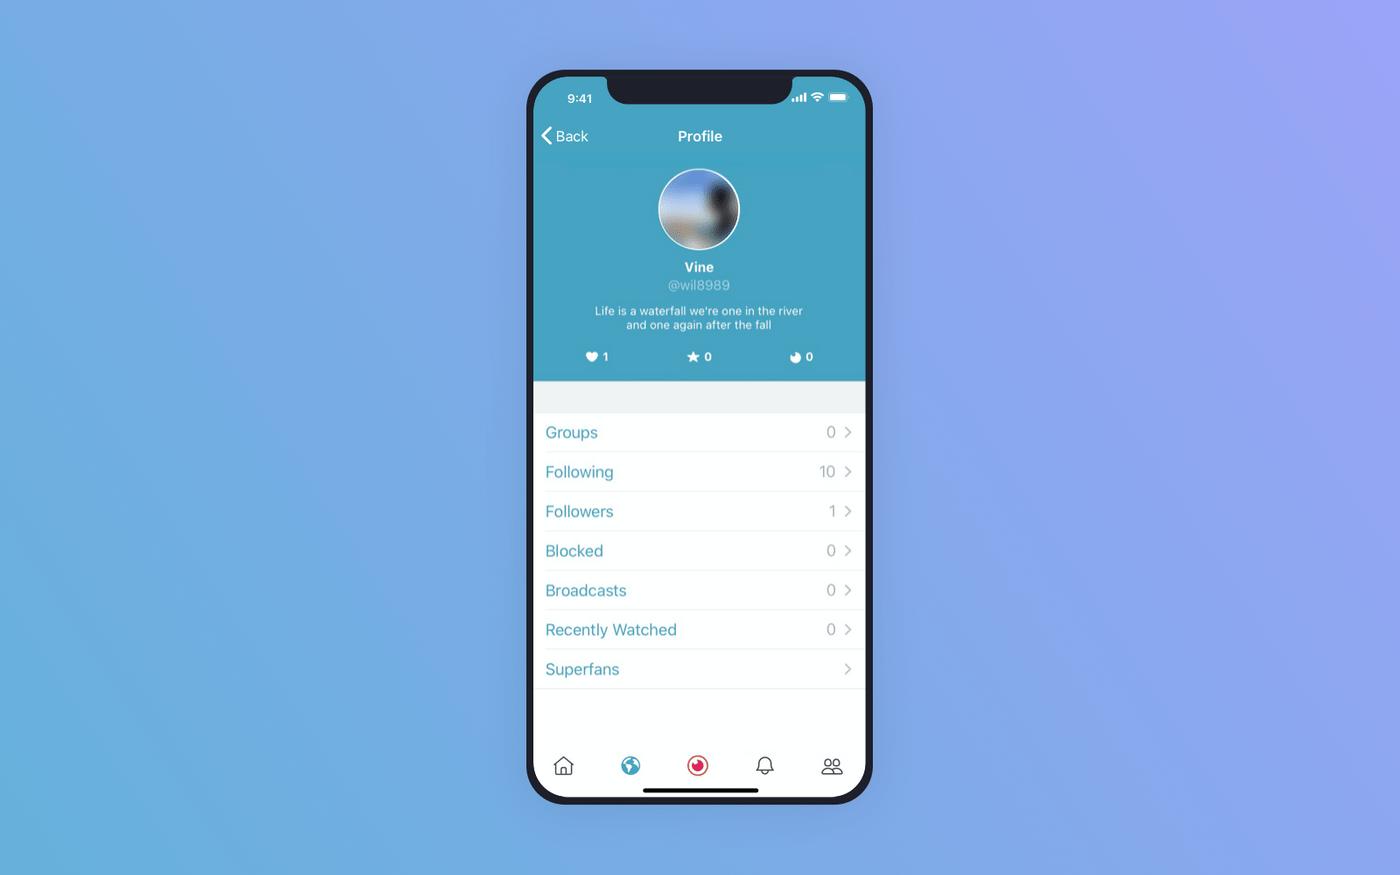 Periscope user profile screen